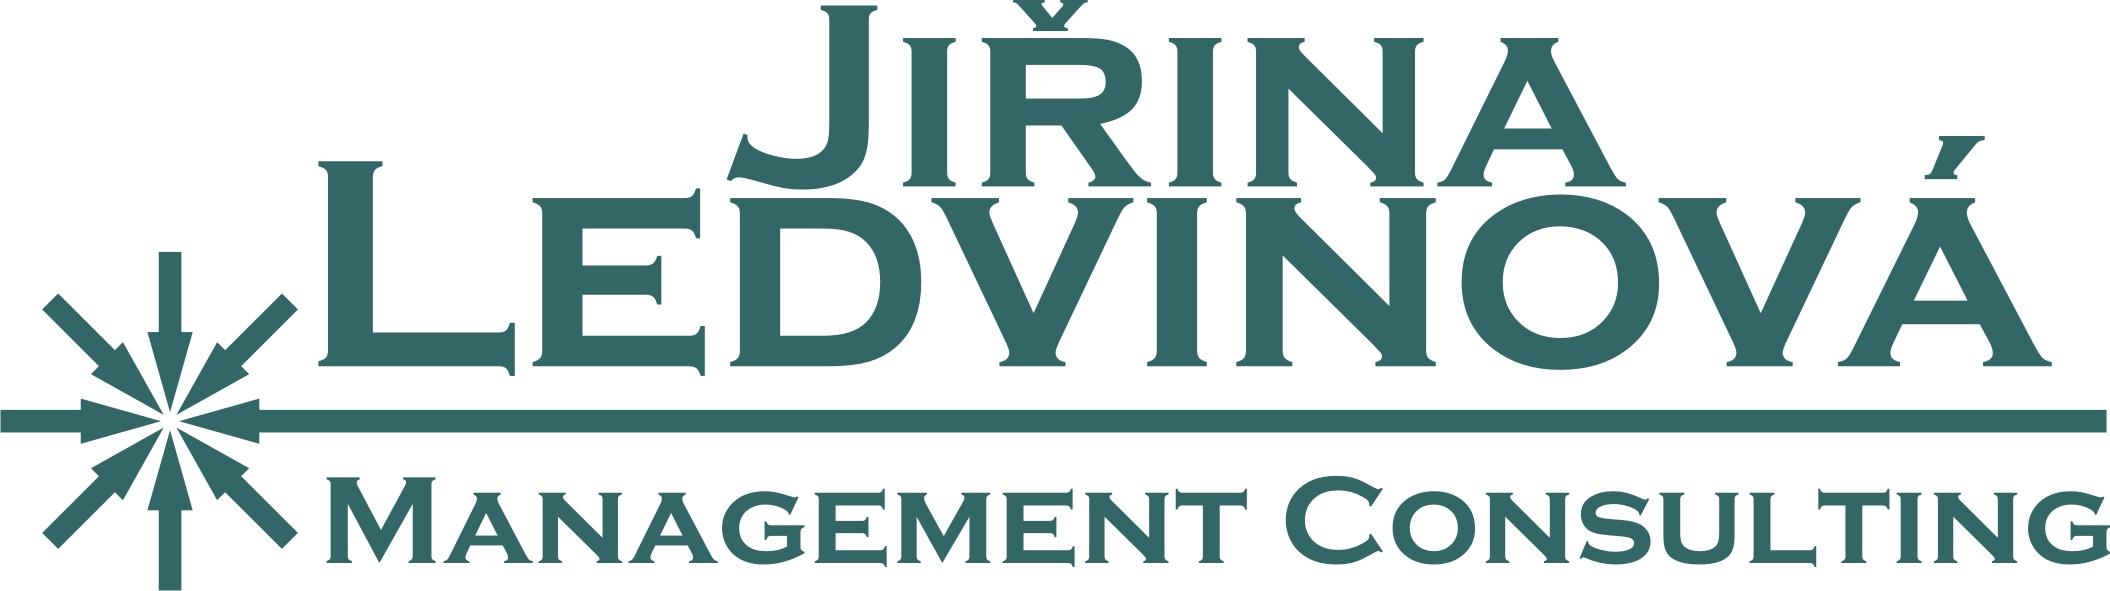 Jiřina Ledvinová - Management Consulting